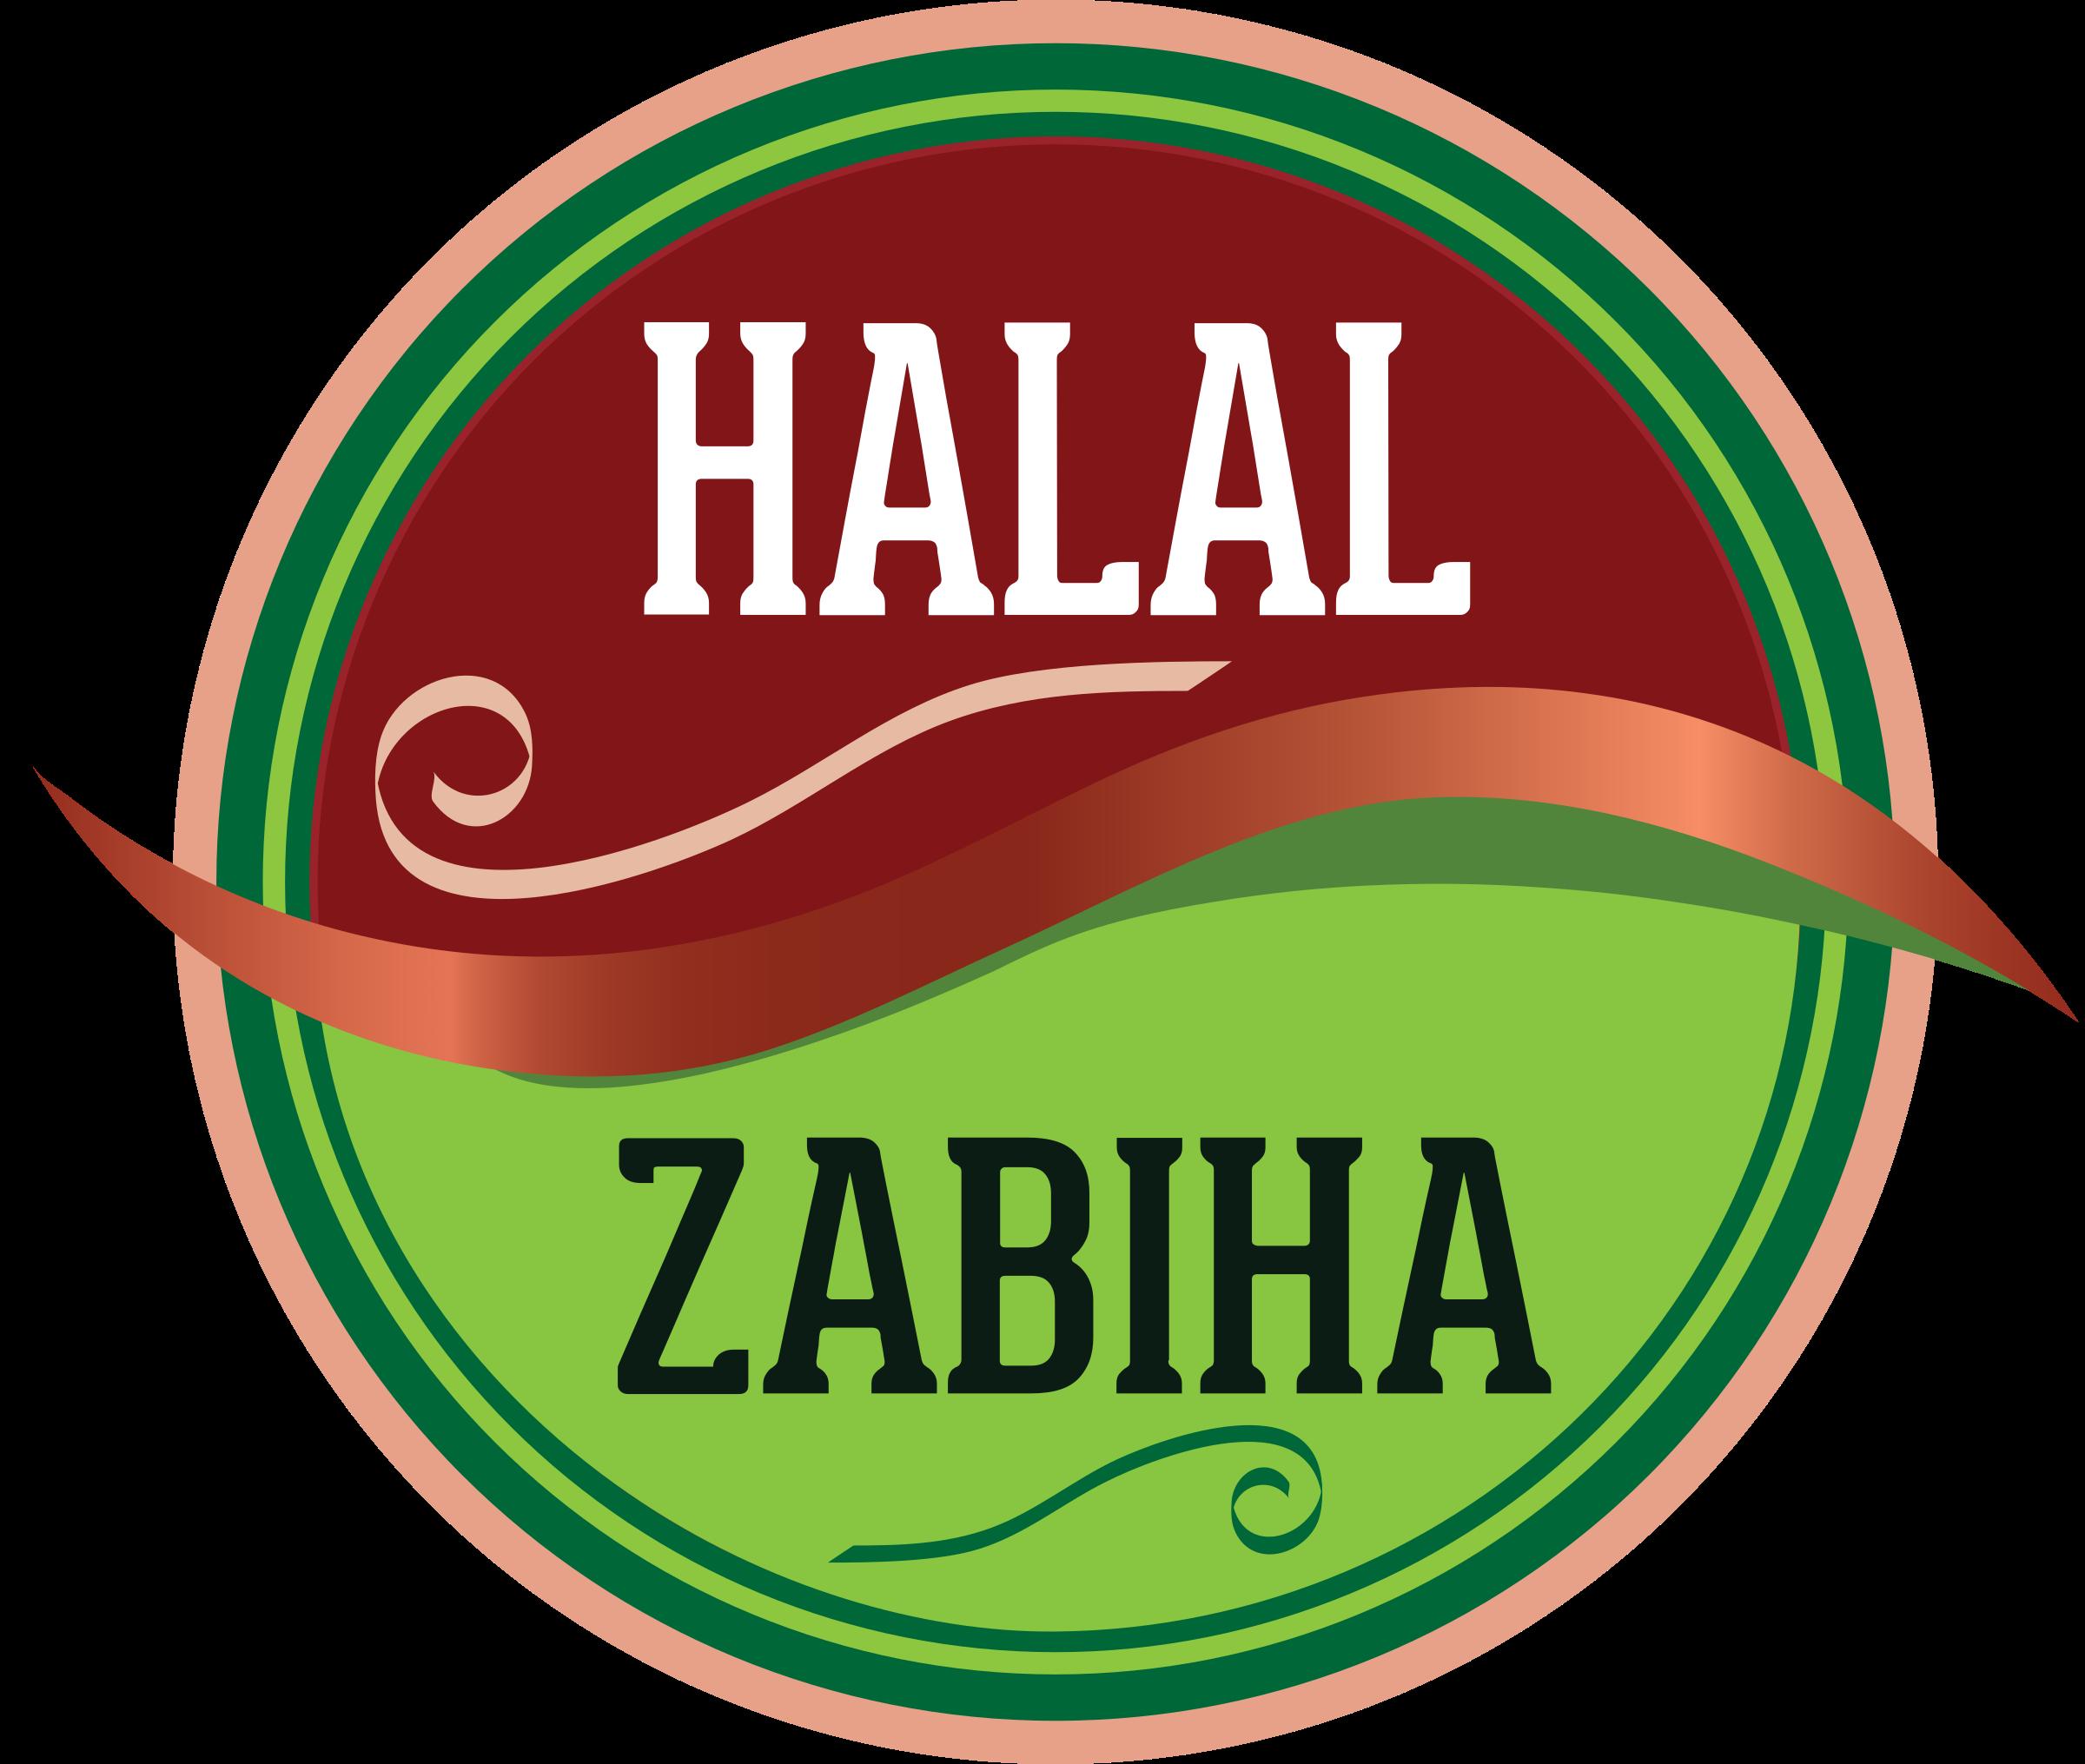 Generic Halal Logo